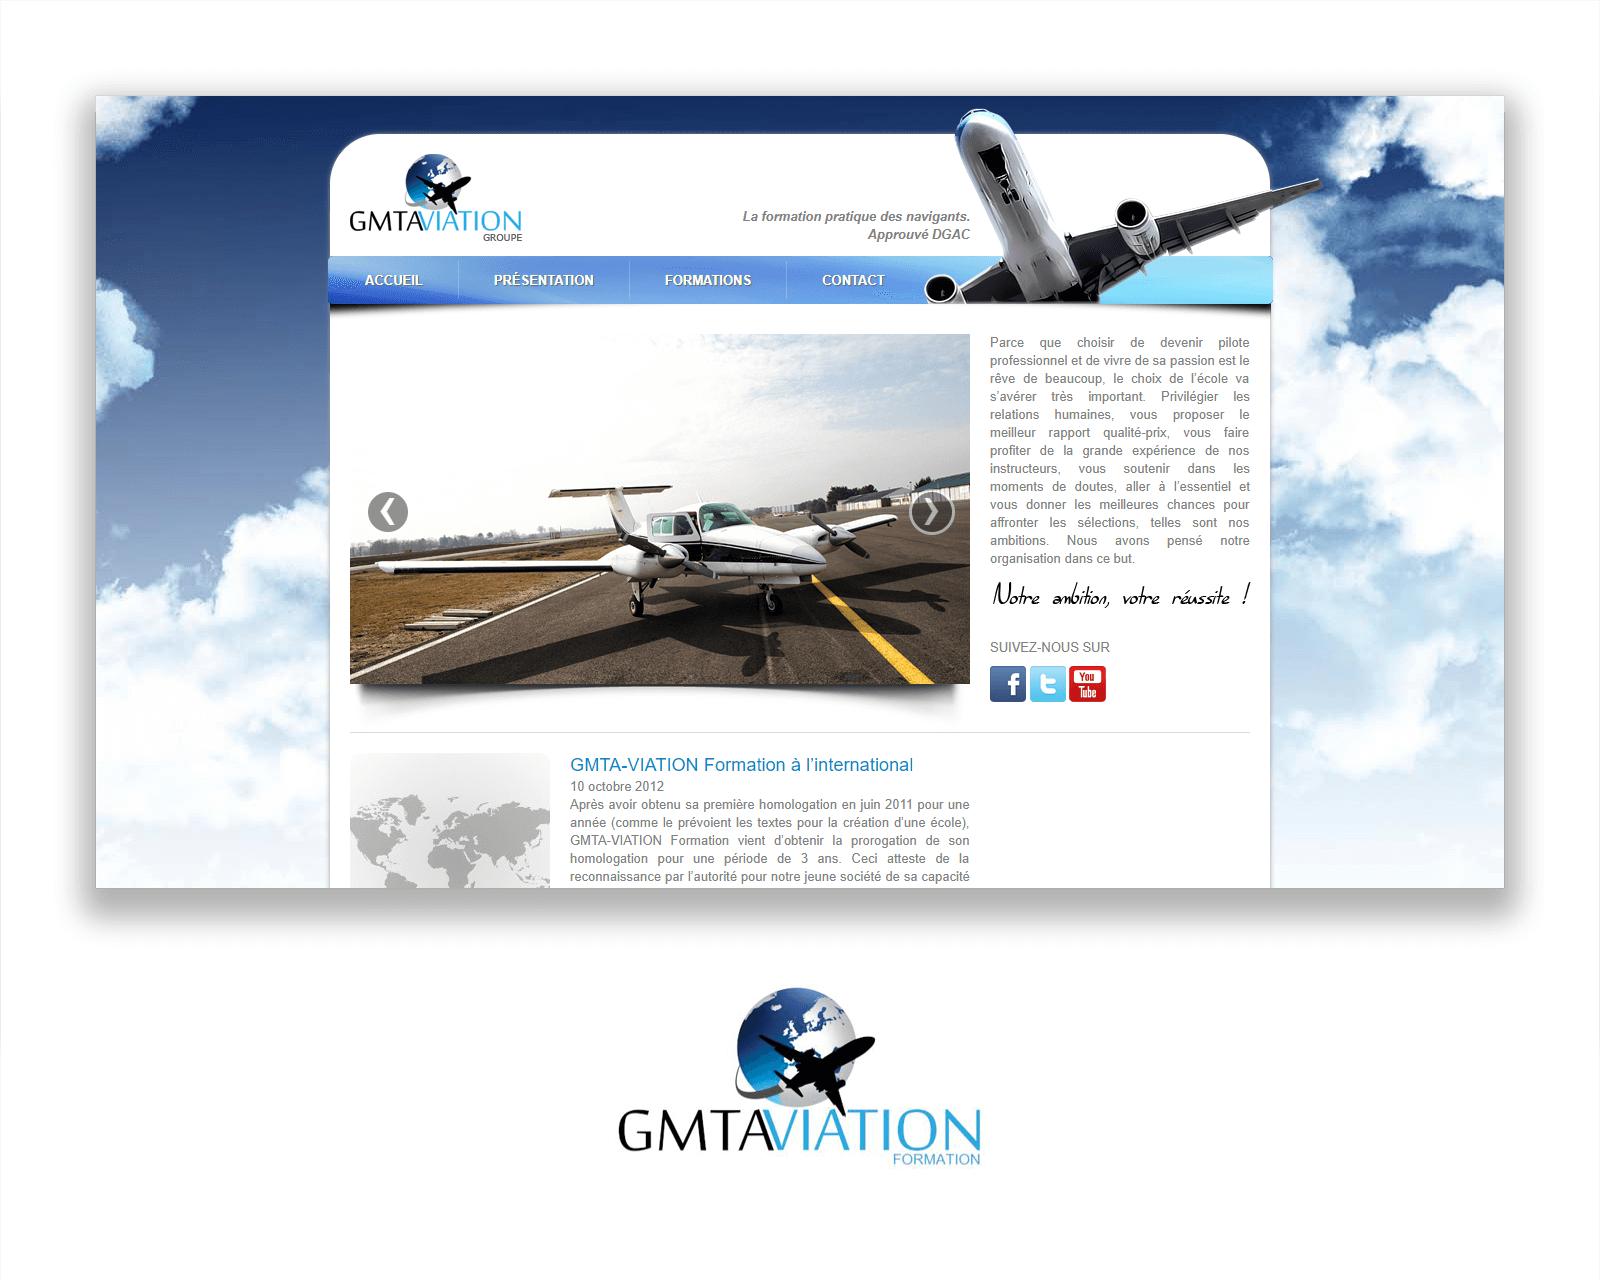 GMTA-Viation